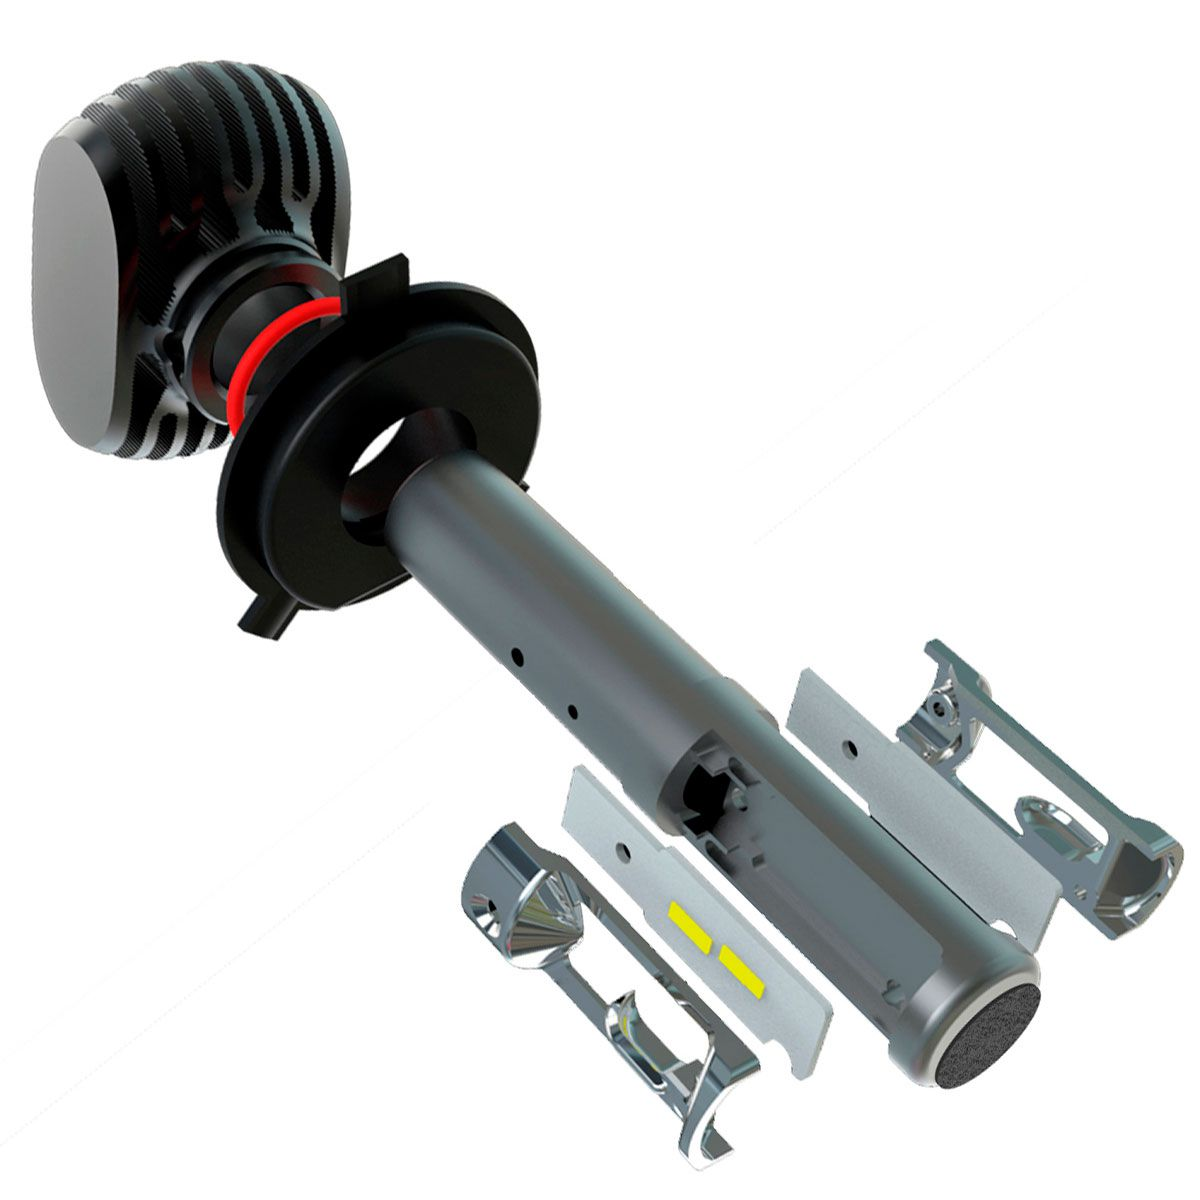 Kit Ultra LED Parati G3 2000 2001 2002 2003 2004 2005 farol duplo tipo xenon farol baixo H7 50W